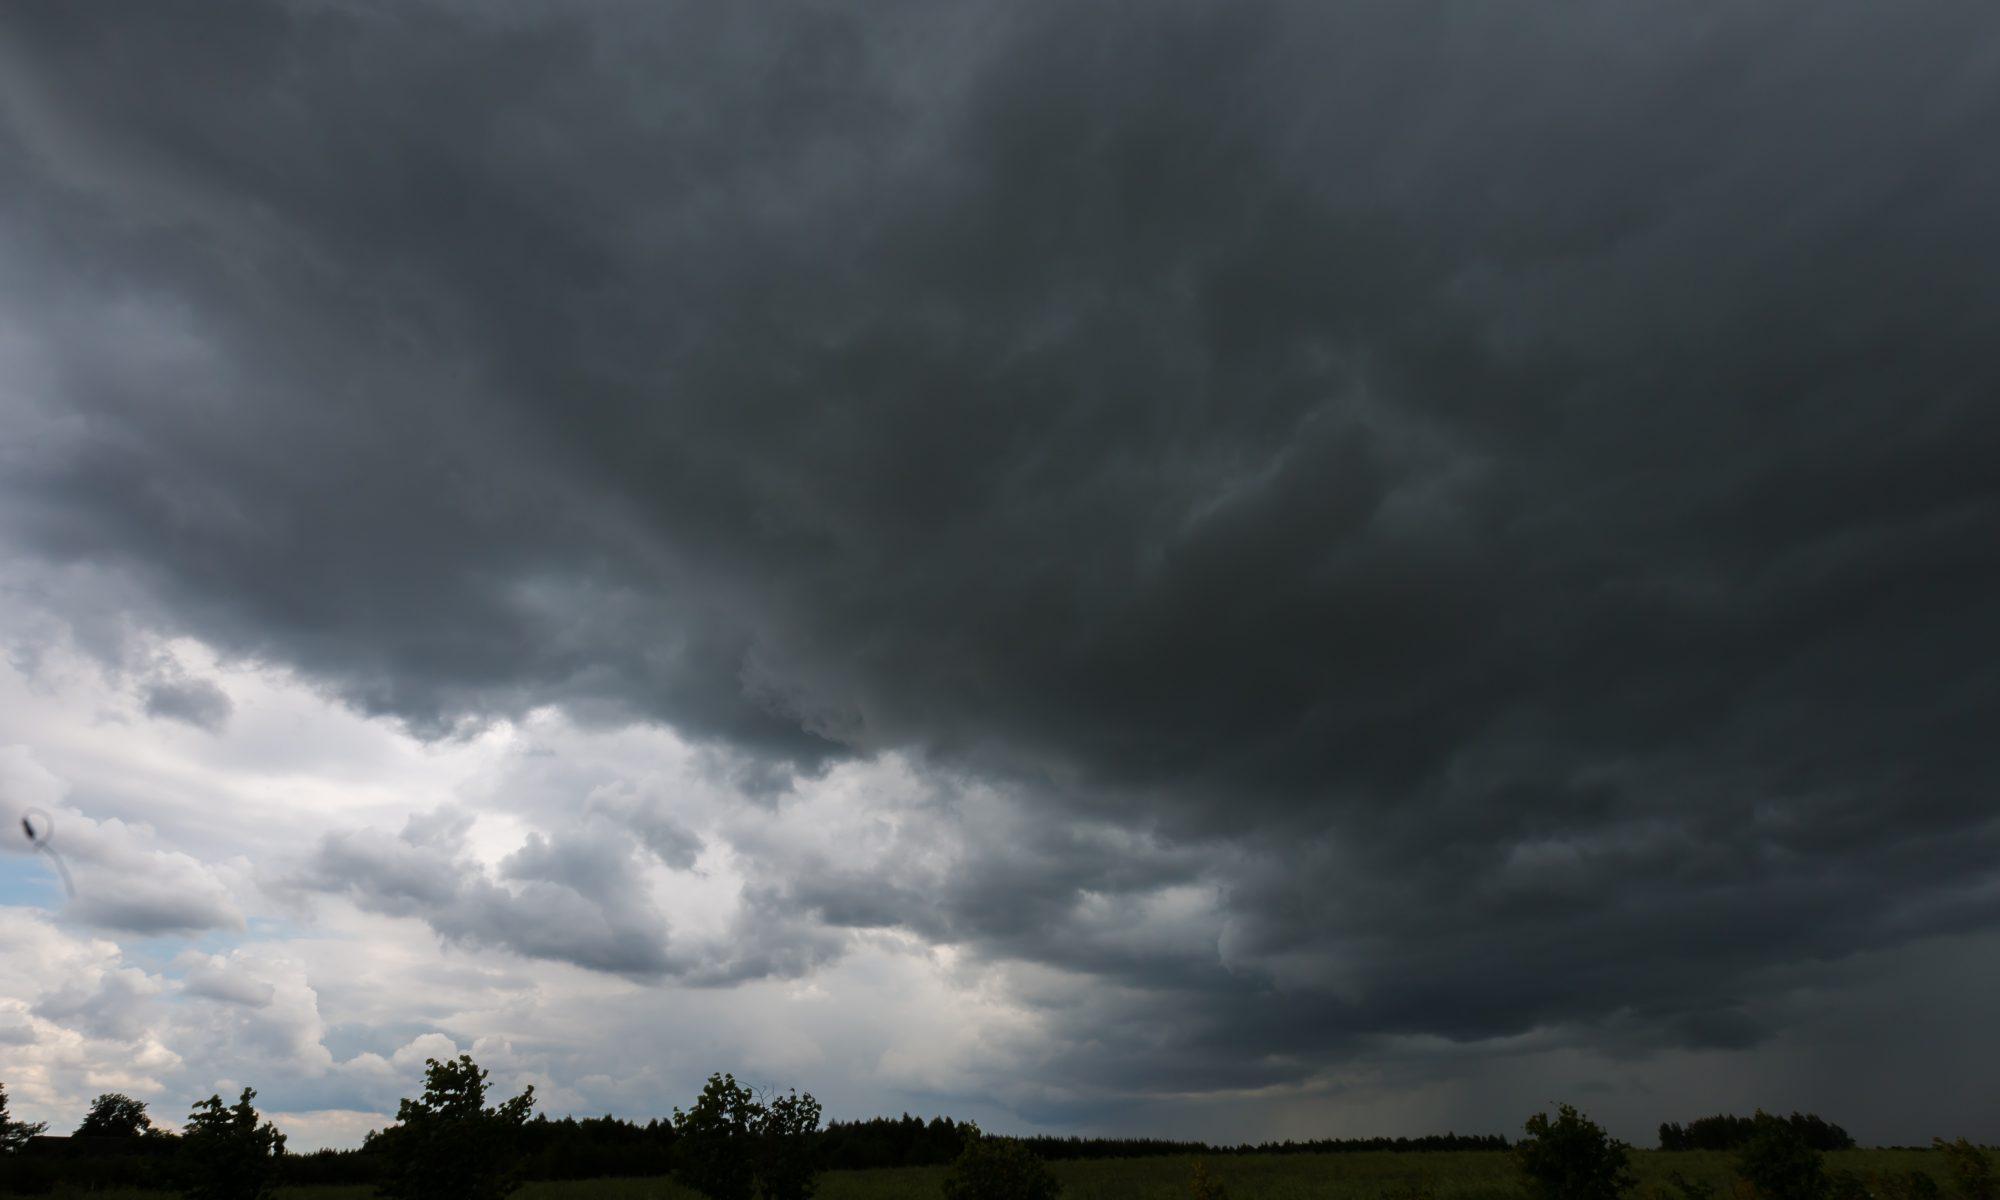 Storm sky over rye field